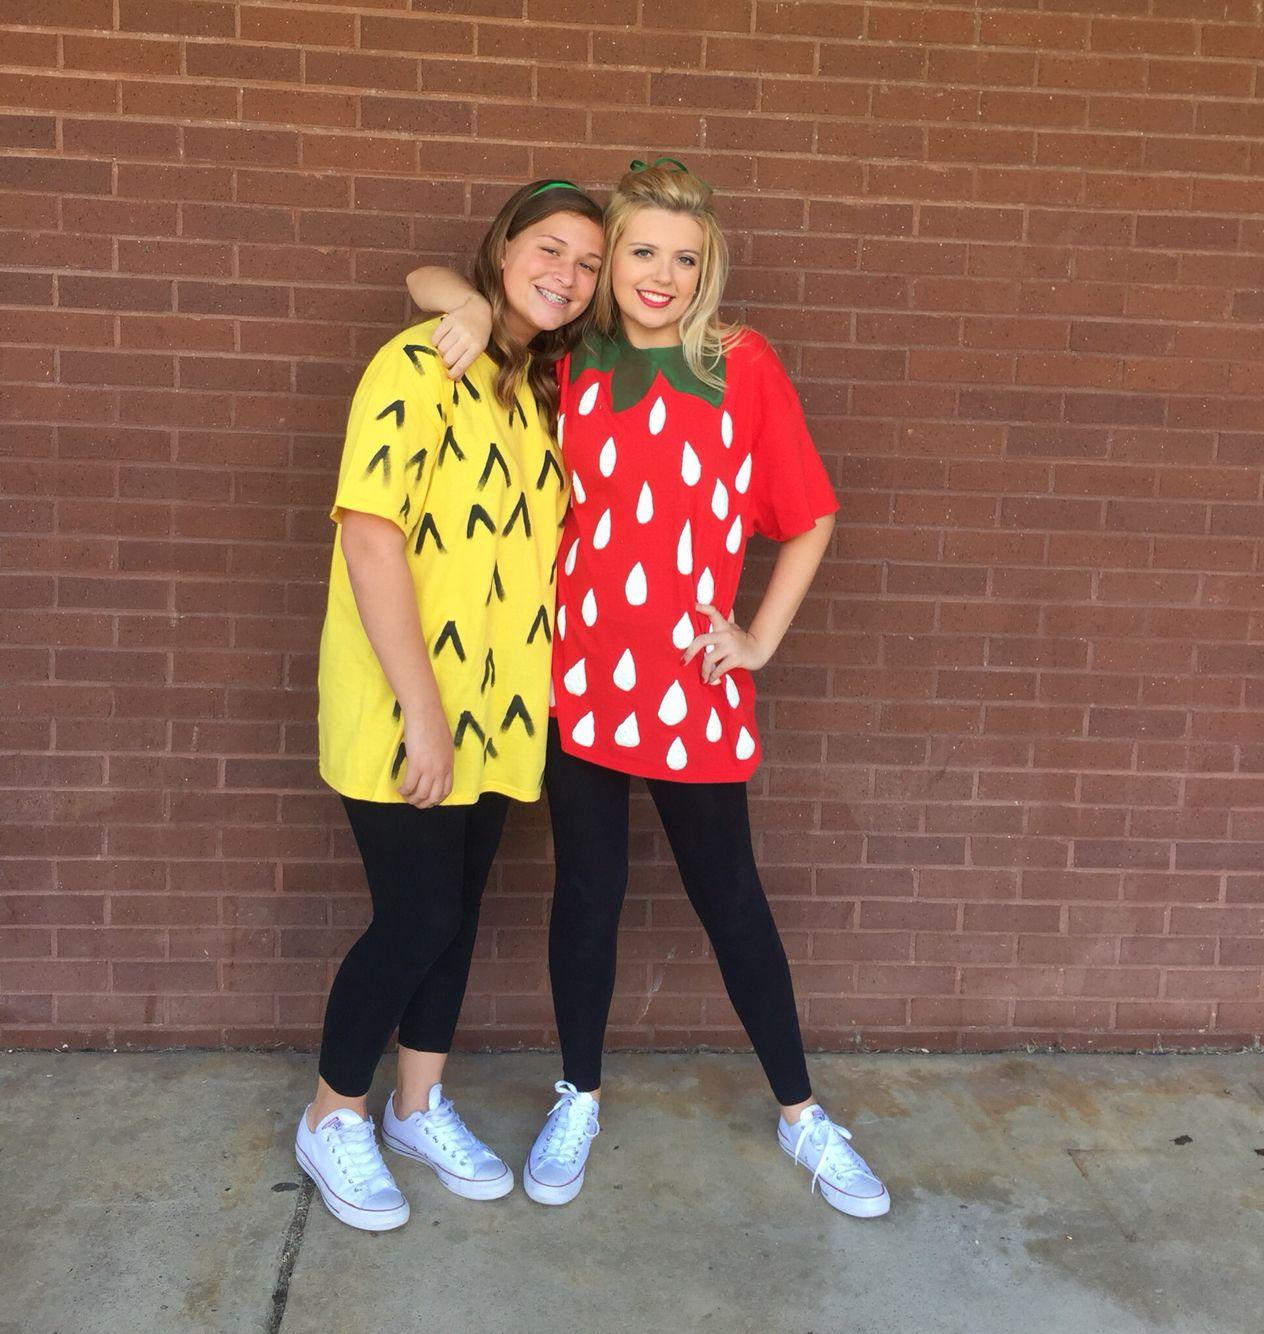 Fruit group day costume diy strawberry pineapple halloween